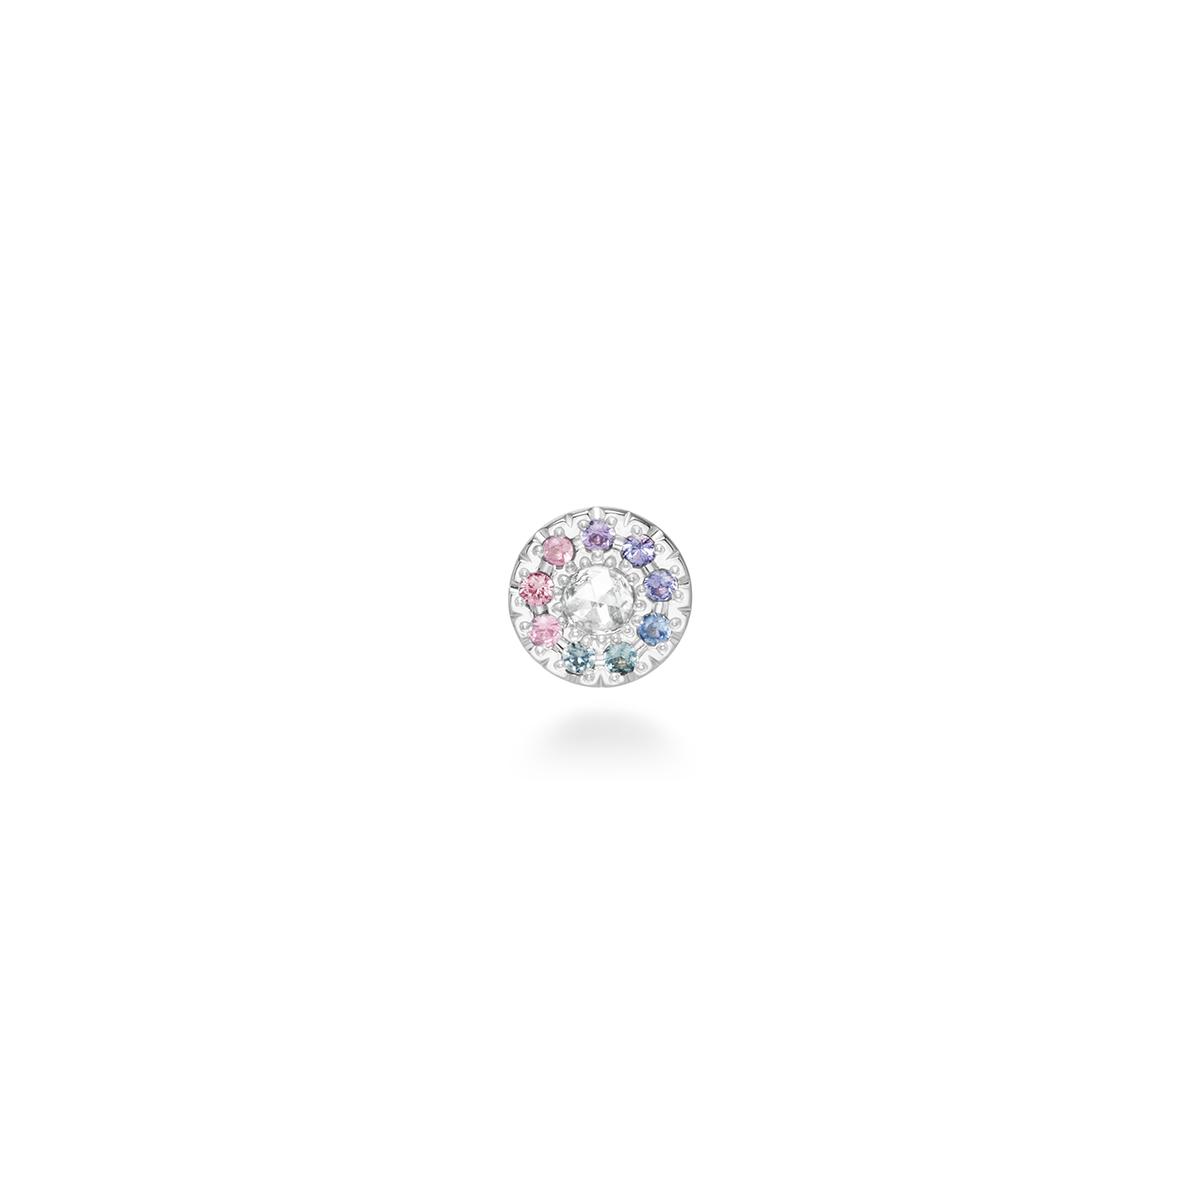 corsage 耳環 (pastel color)